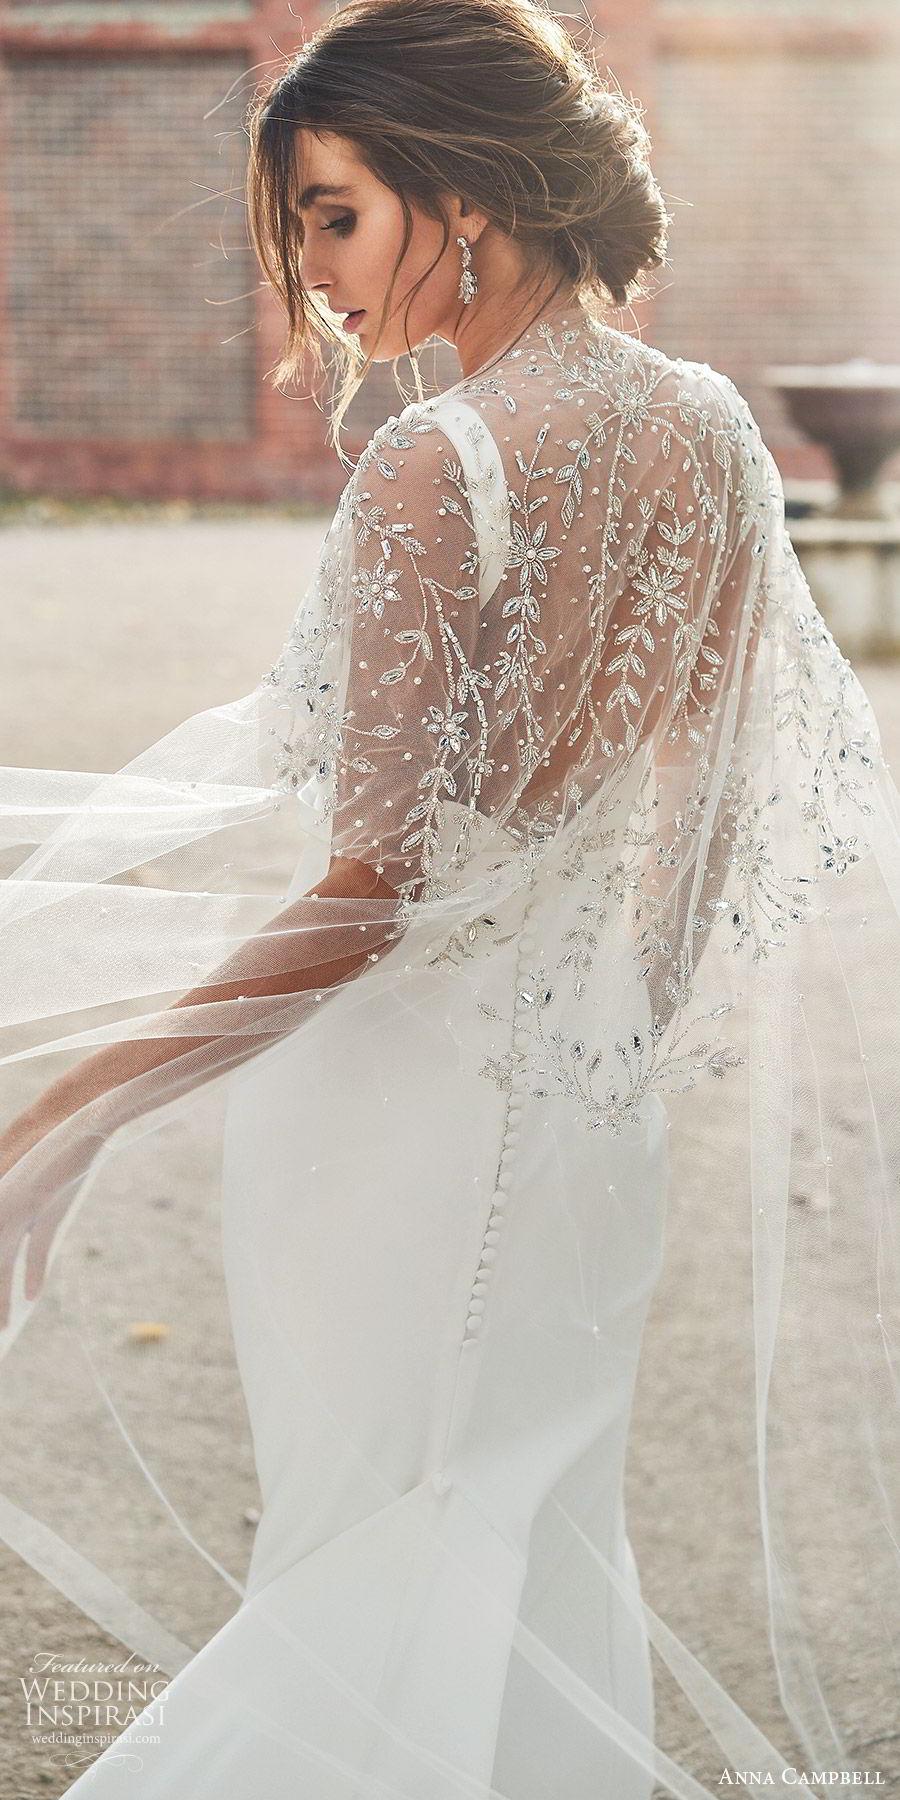 anna campbell 2020 bridal sleeveless thick straps plunging v neckline minimally embellished mermaid trumpet sheath wedding dress (6) clean modern low v back chapel train cape zbv